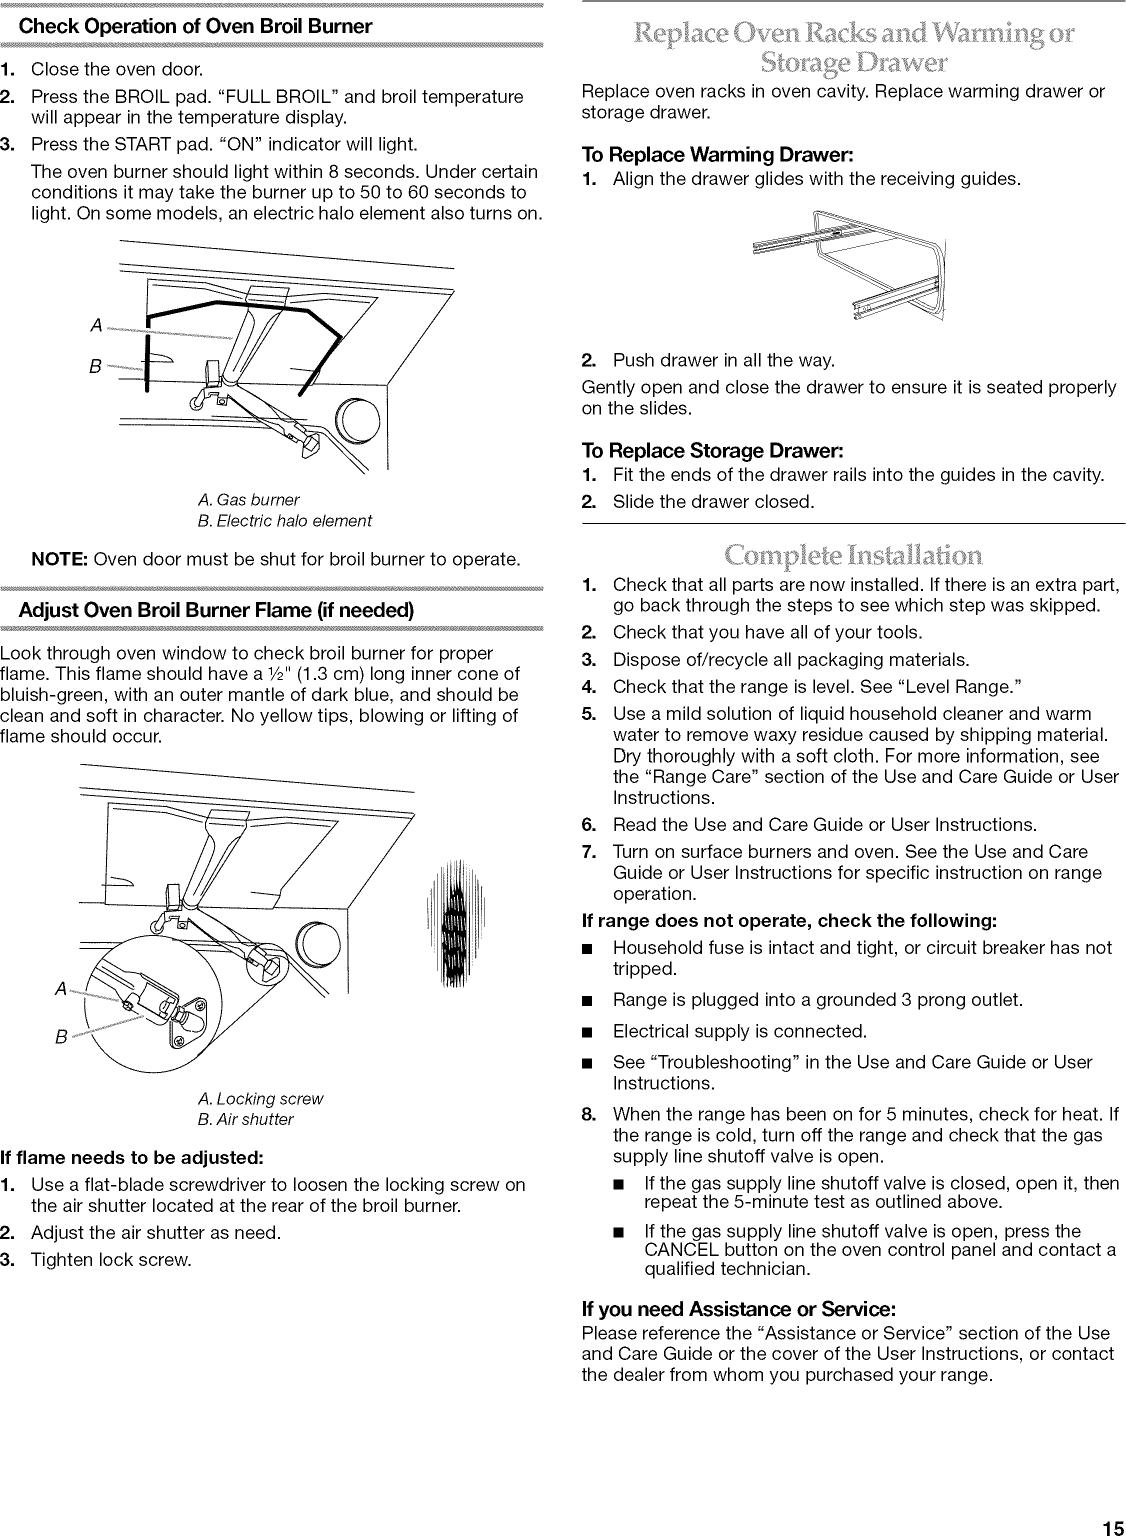 Kitchenaid KGSK901SSS03 User Manual 30 FREESTANDING GAS